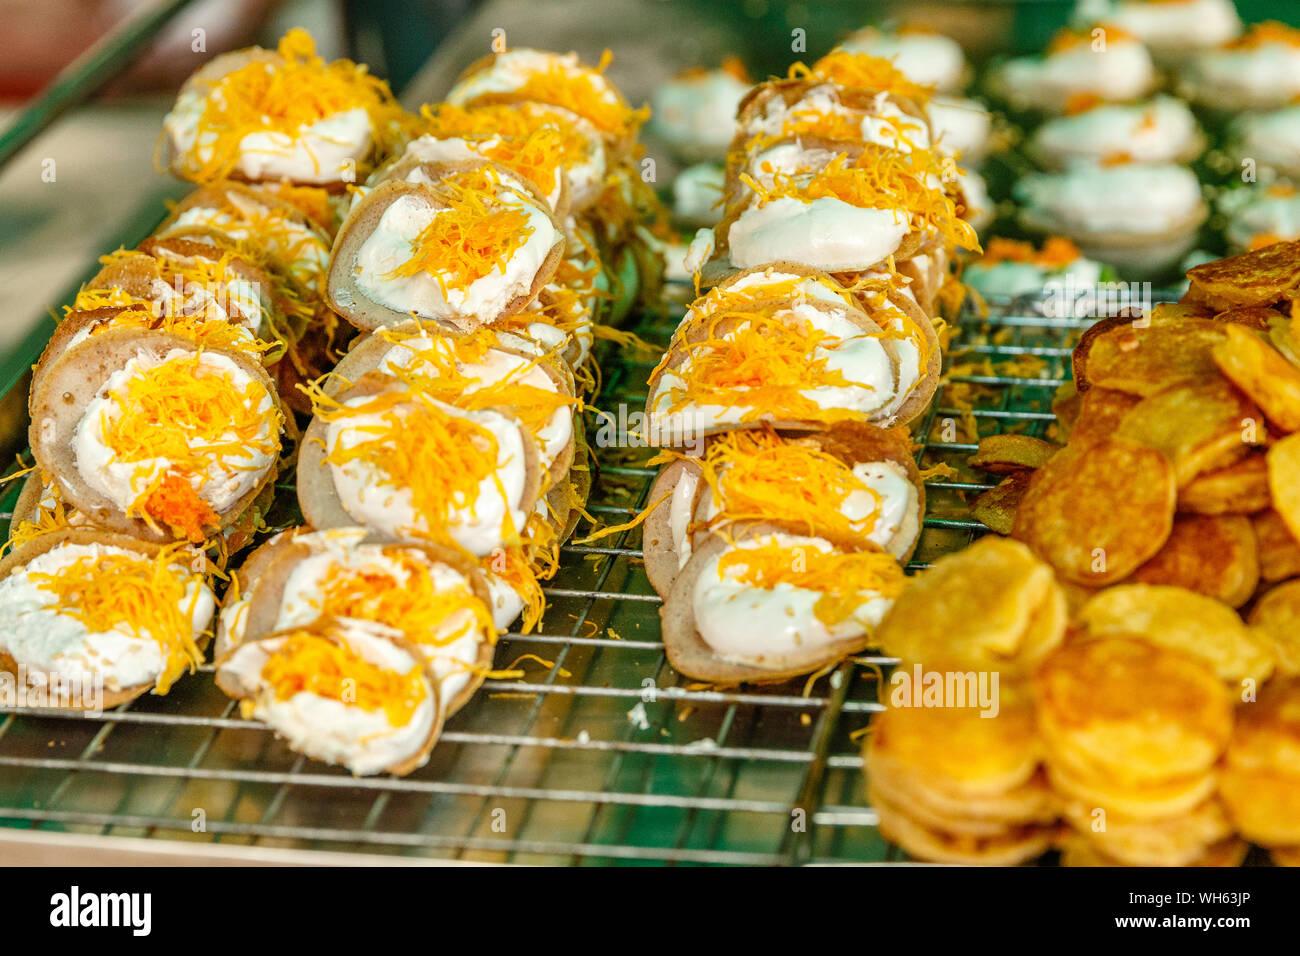 Khanom Buang - Thai traditional dessert, crispy pancake made with cream and Foi Thong (egg golden threads) on top. Thai street food. Bangkok, Thailand. Stock Photo